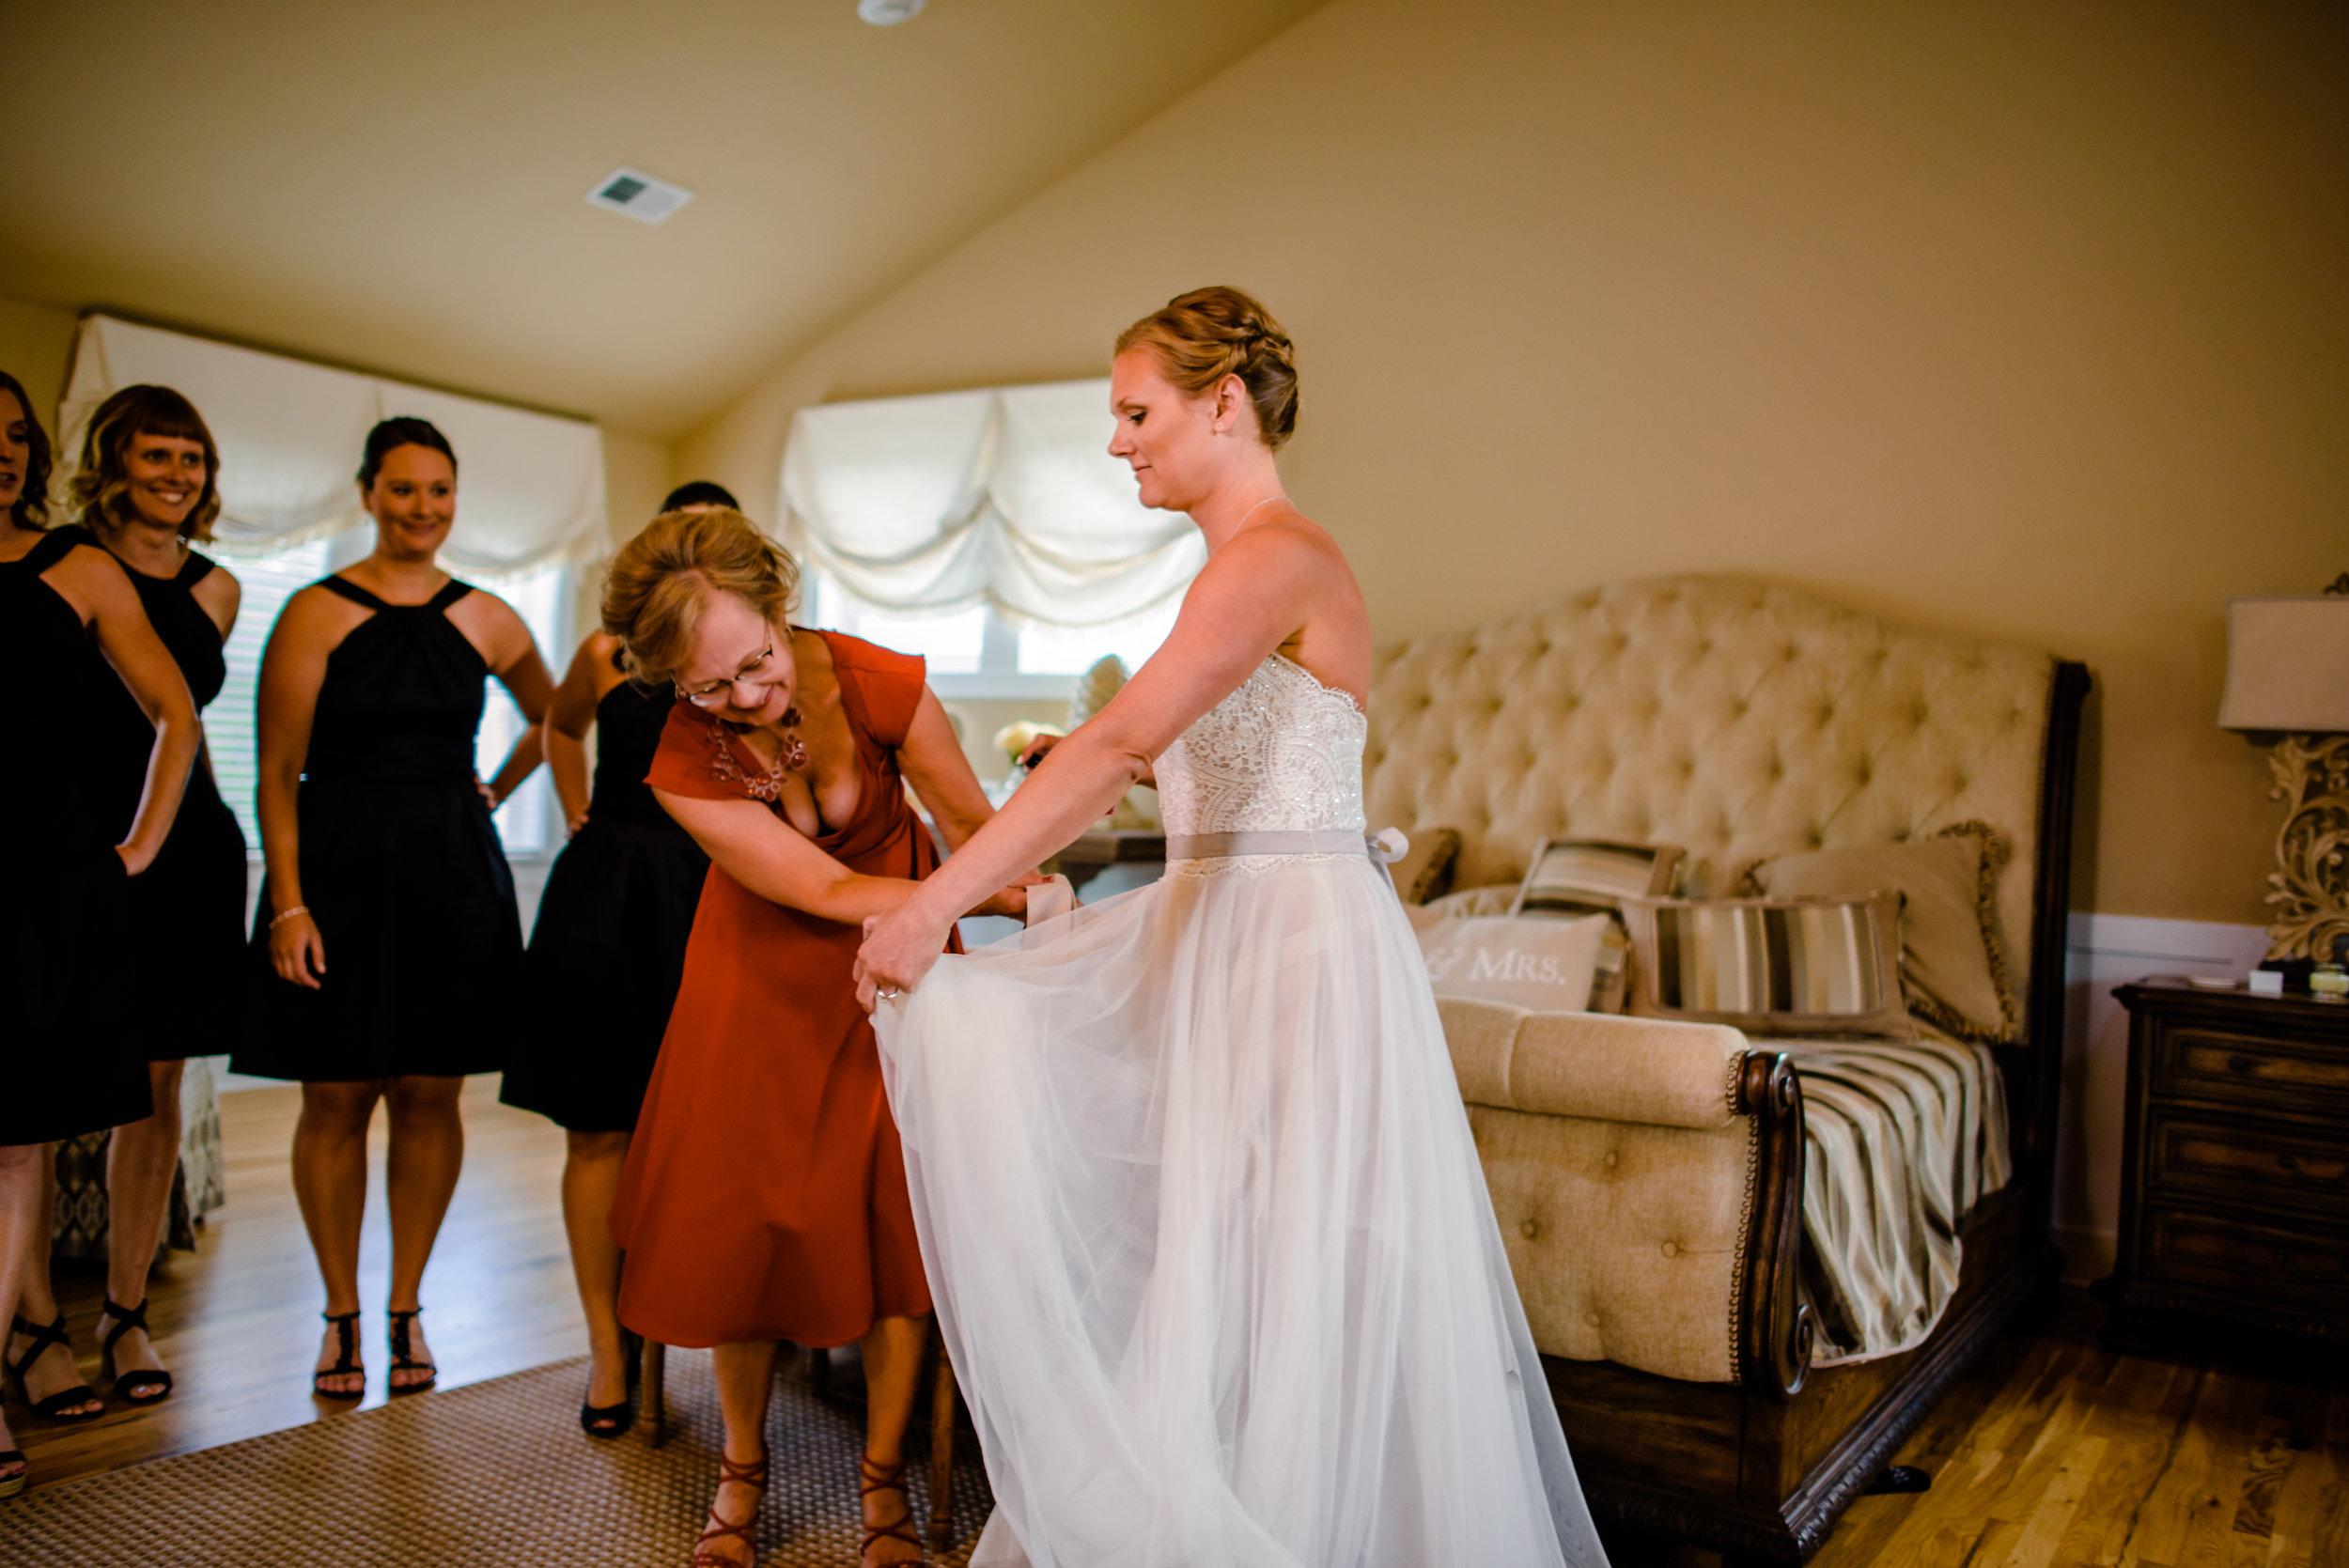 The Black Stallion Wedding - Getting Ready